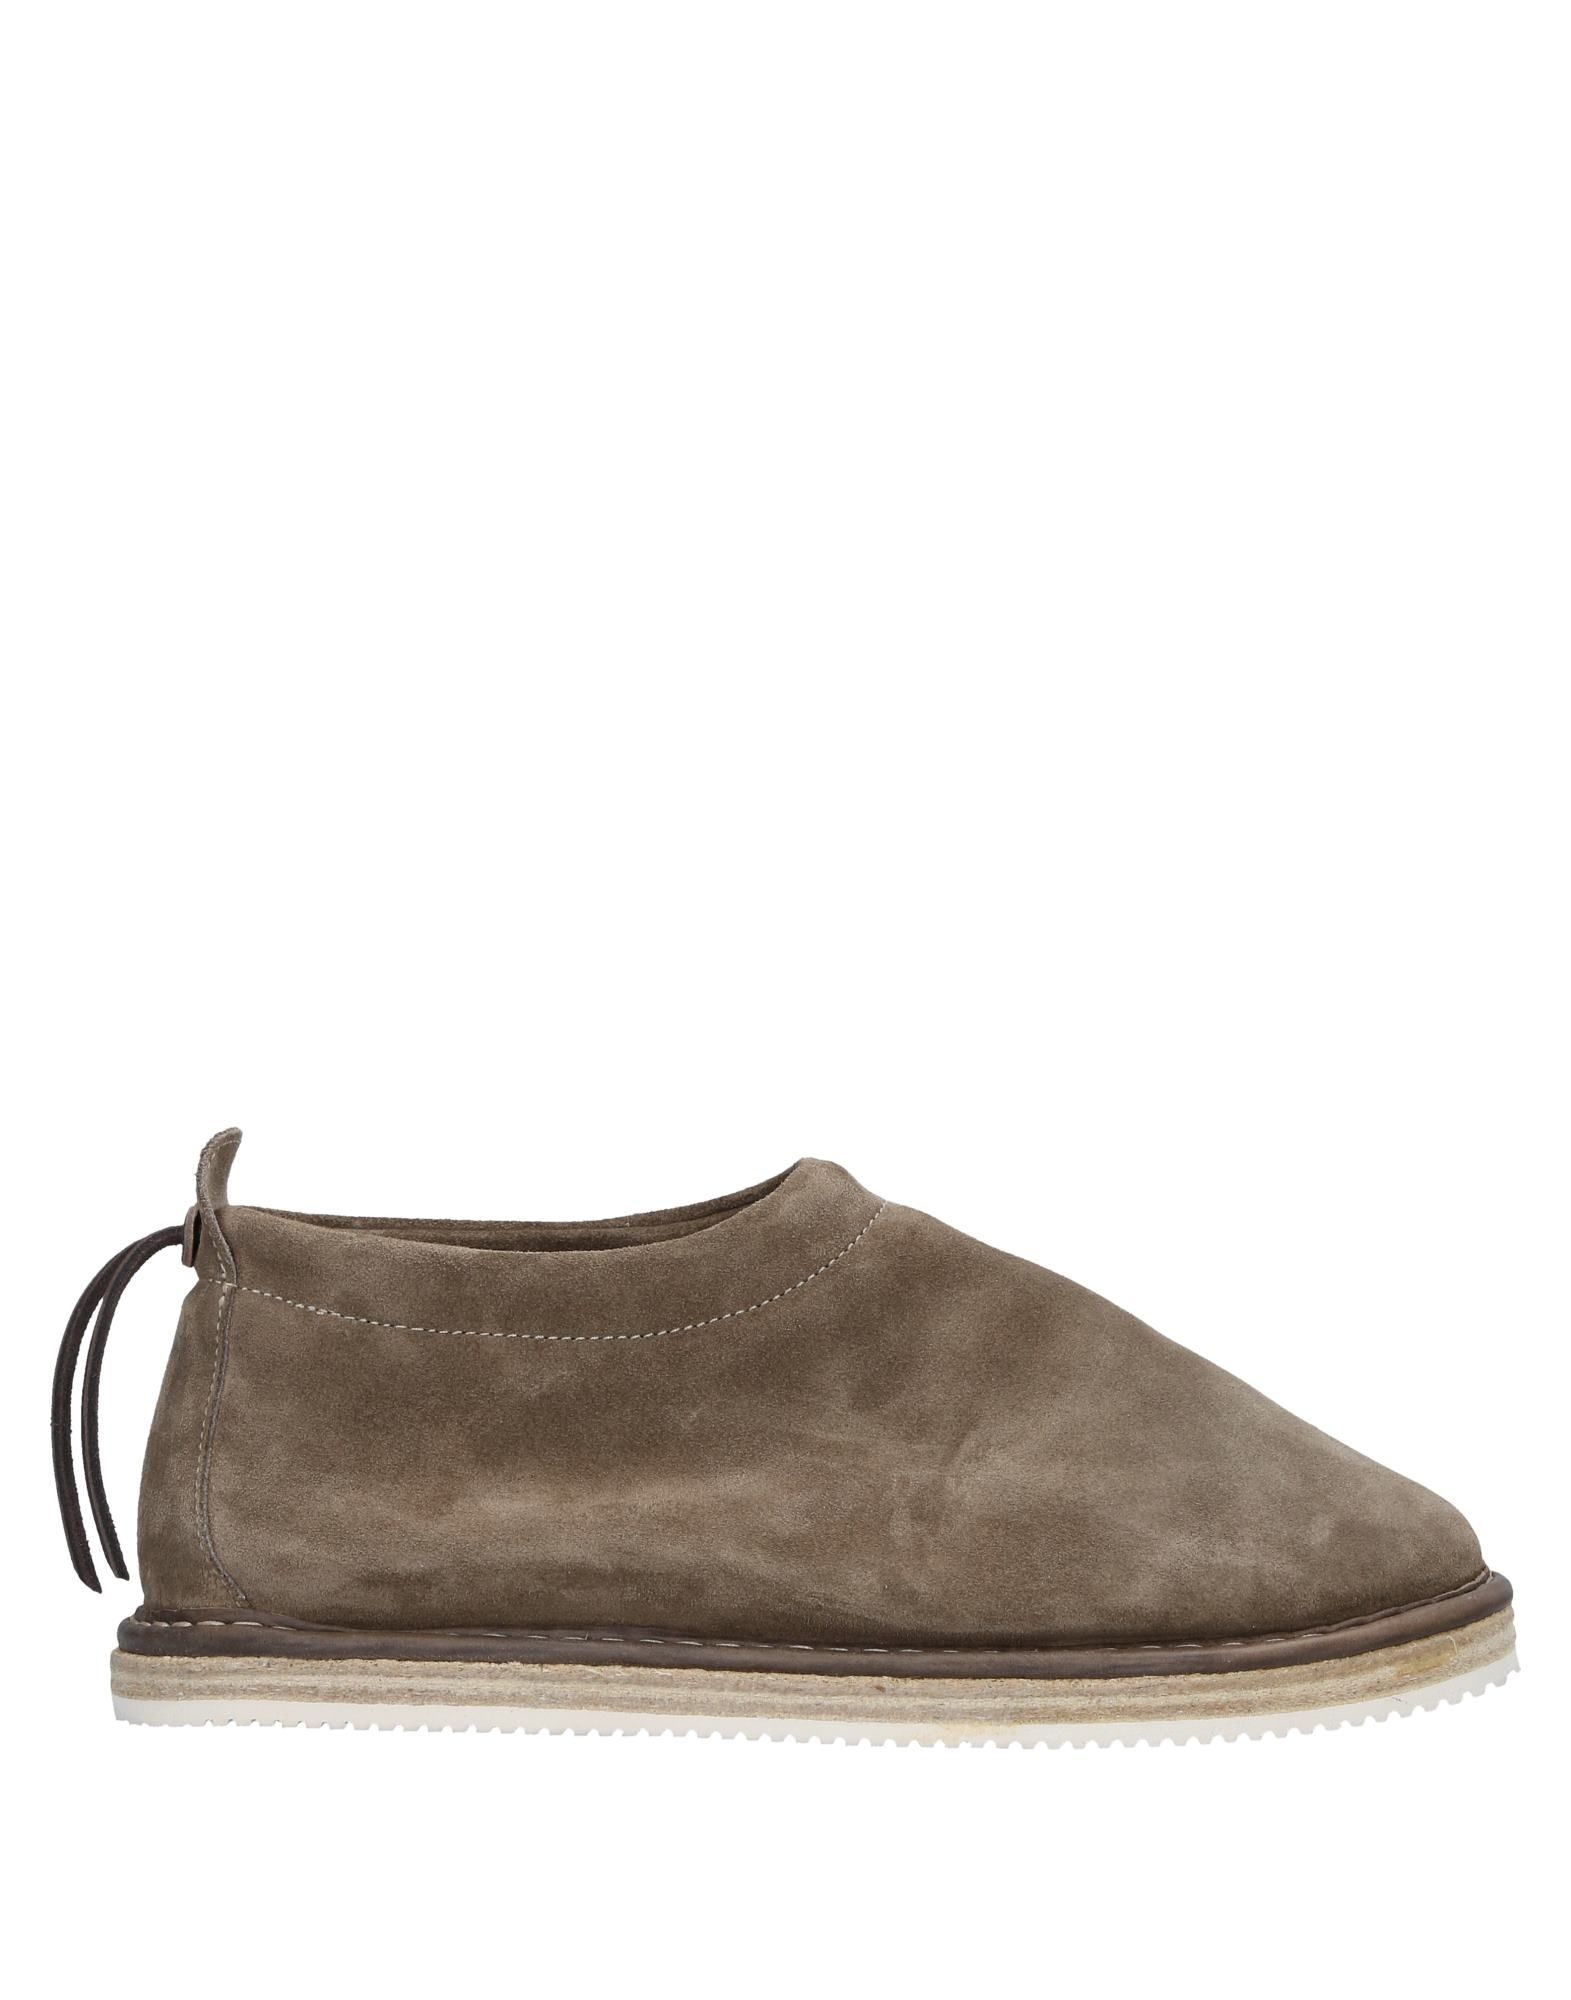 Buttero® Espadrilles Herren  11544800SH Gute Qualität beliebte Schuhe